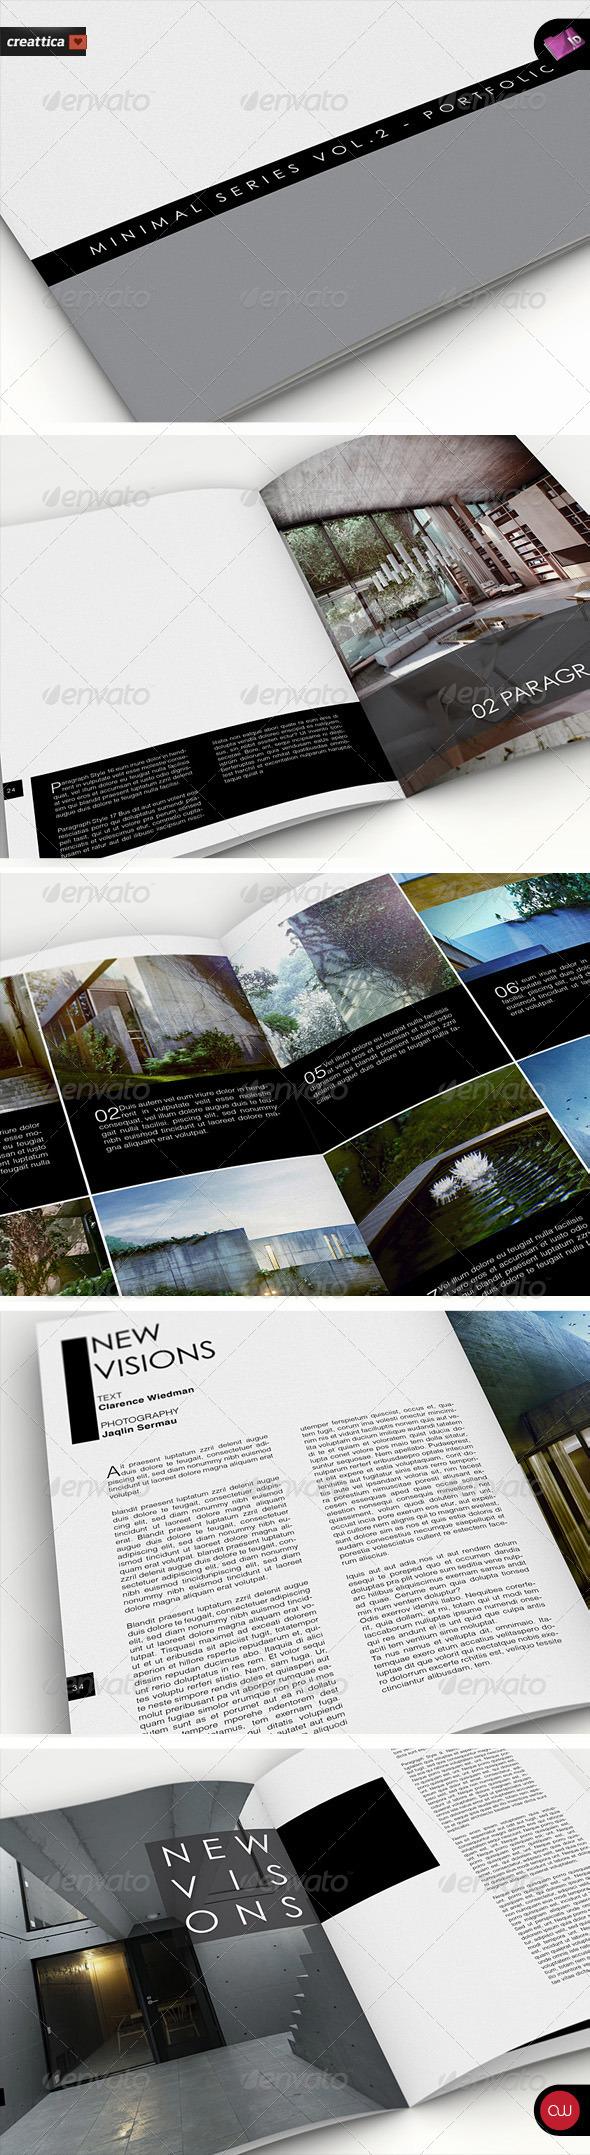 Portfolio Brochure Template - Vol.4 - Portfolio Brochures